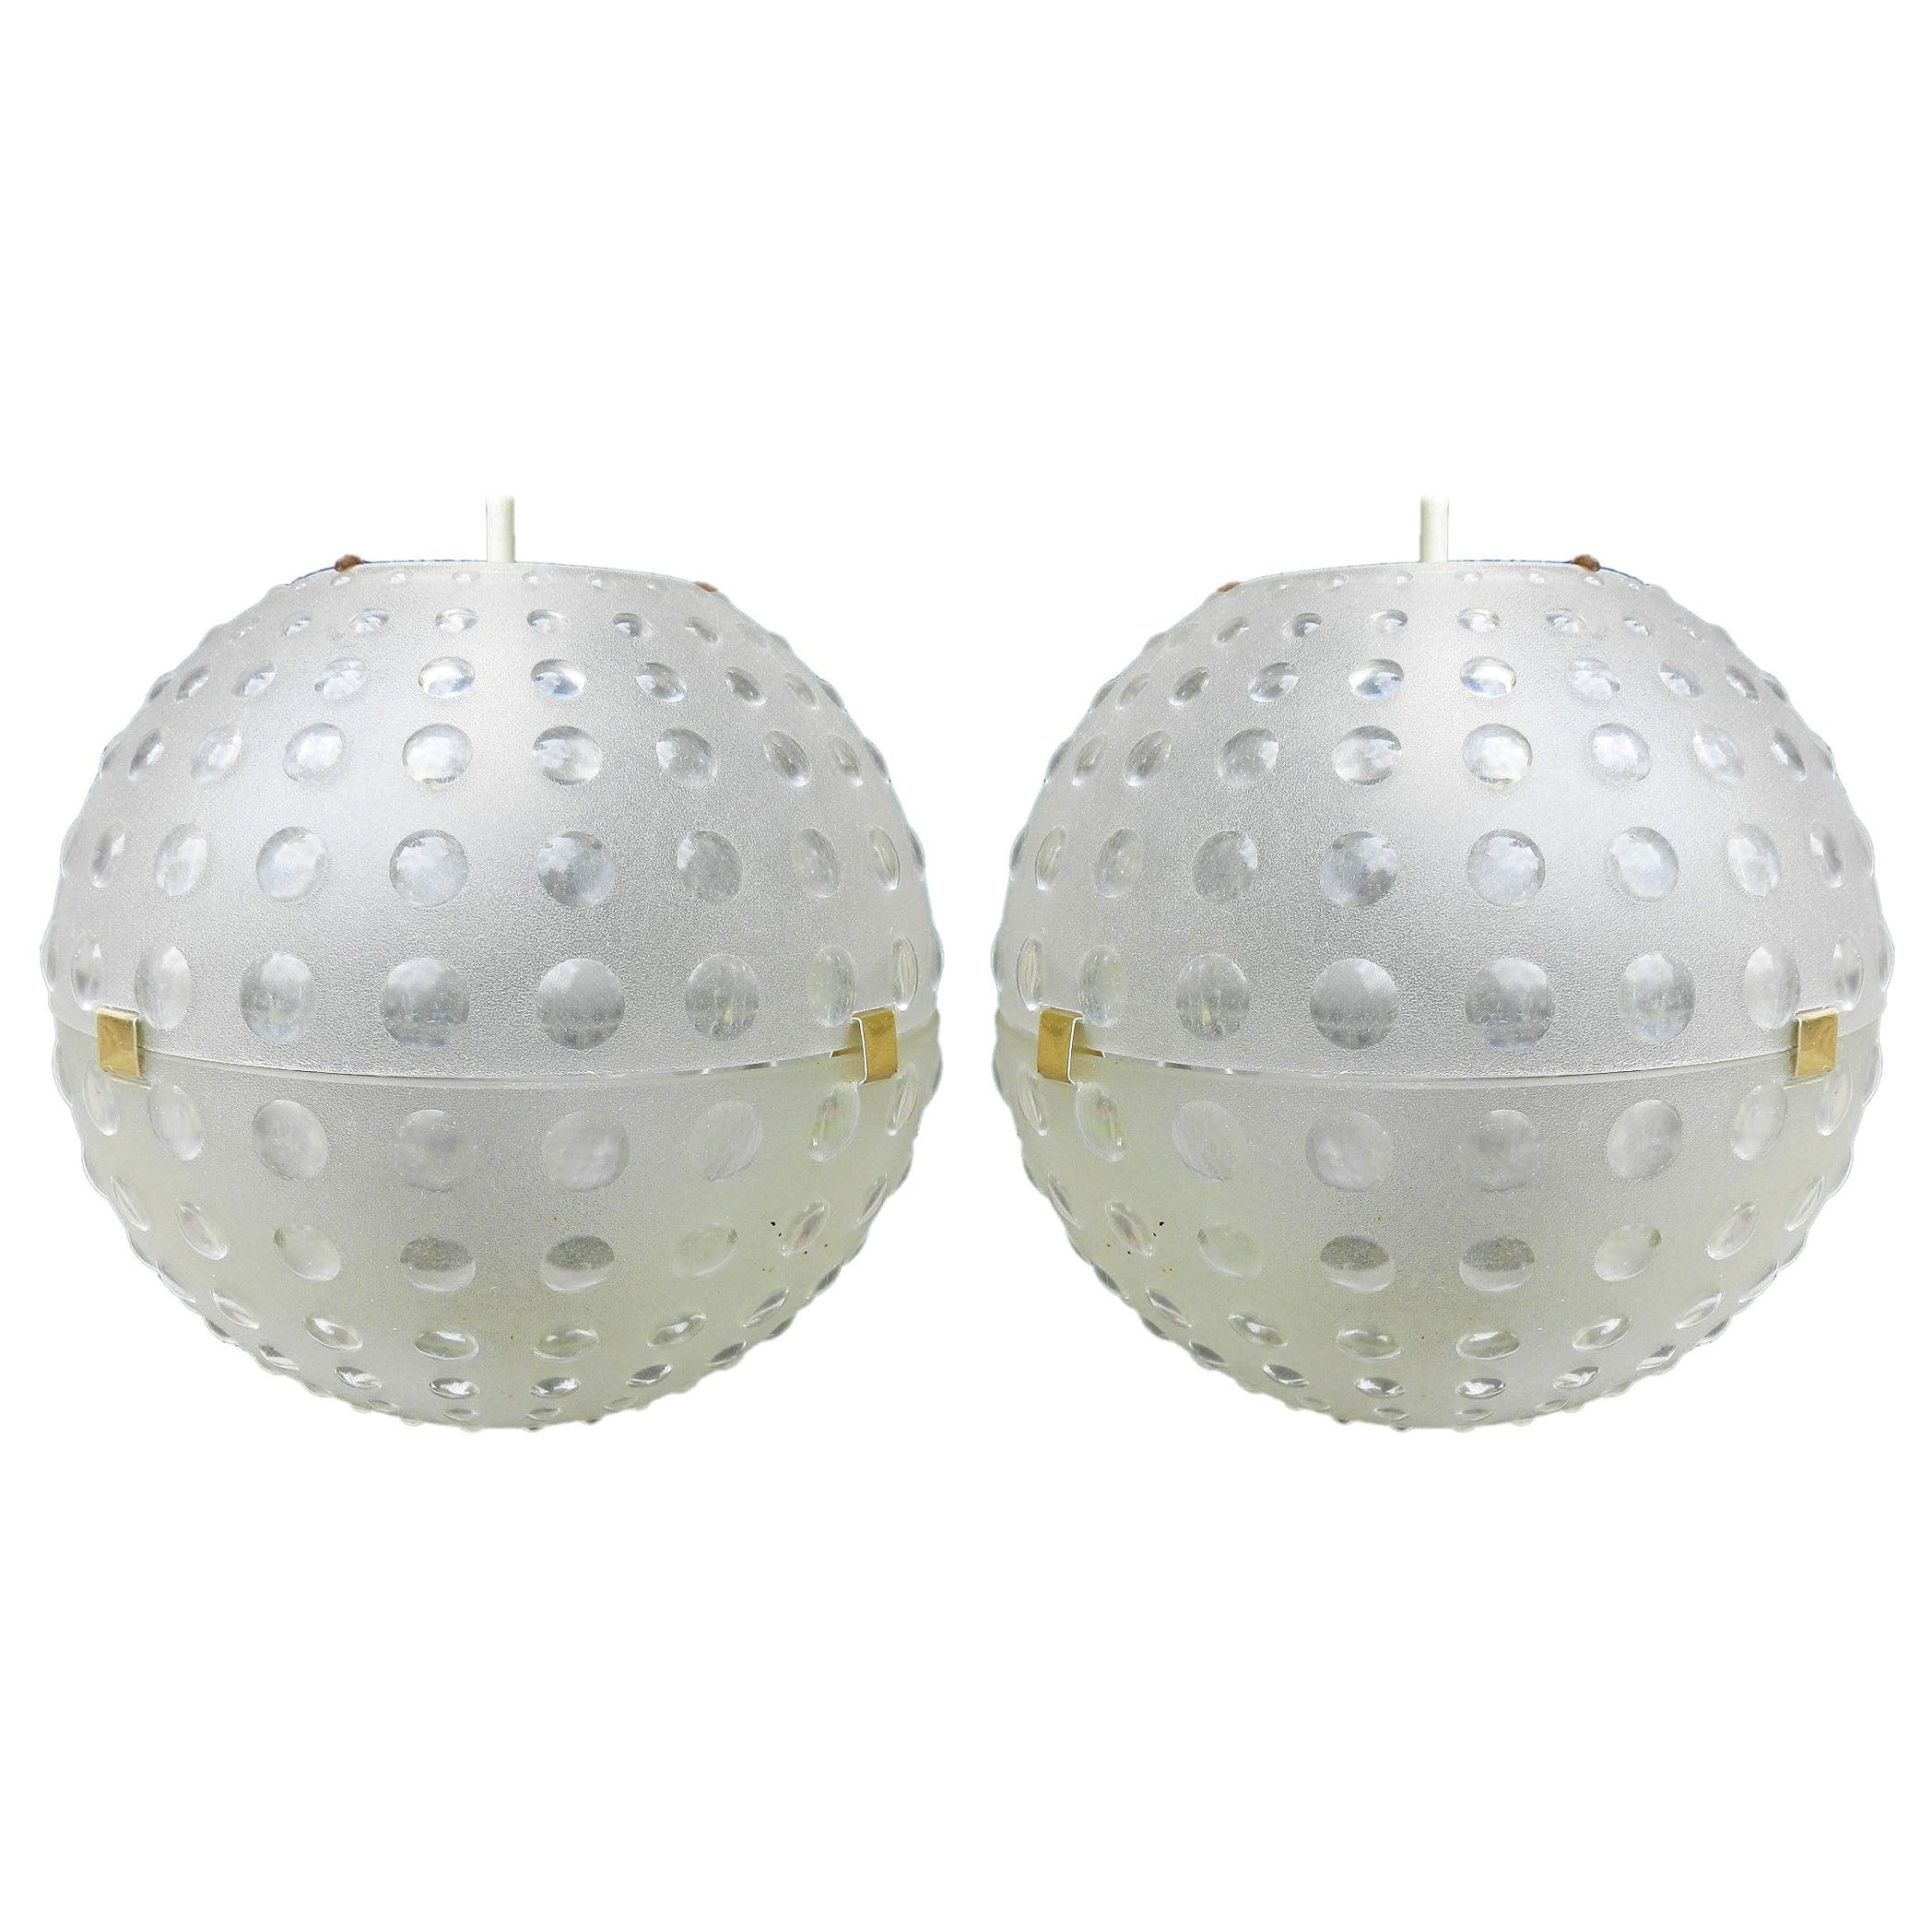 Pair of Midcentury Globe Pendant Lights Opaque Molded Plastic, circa 1960